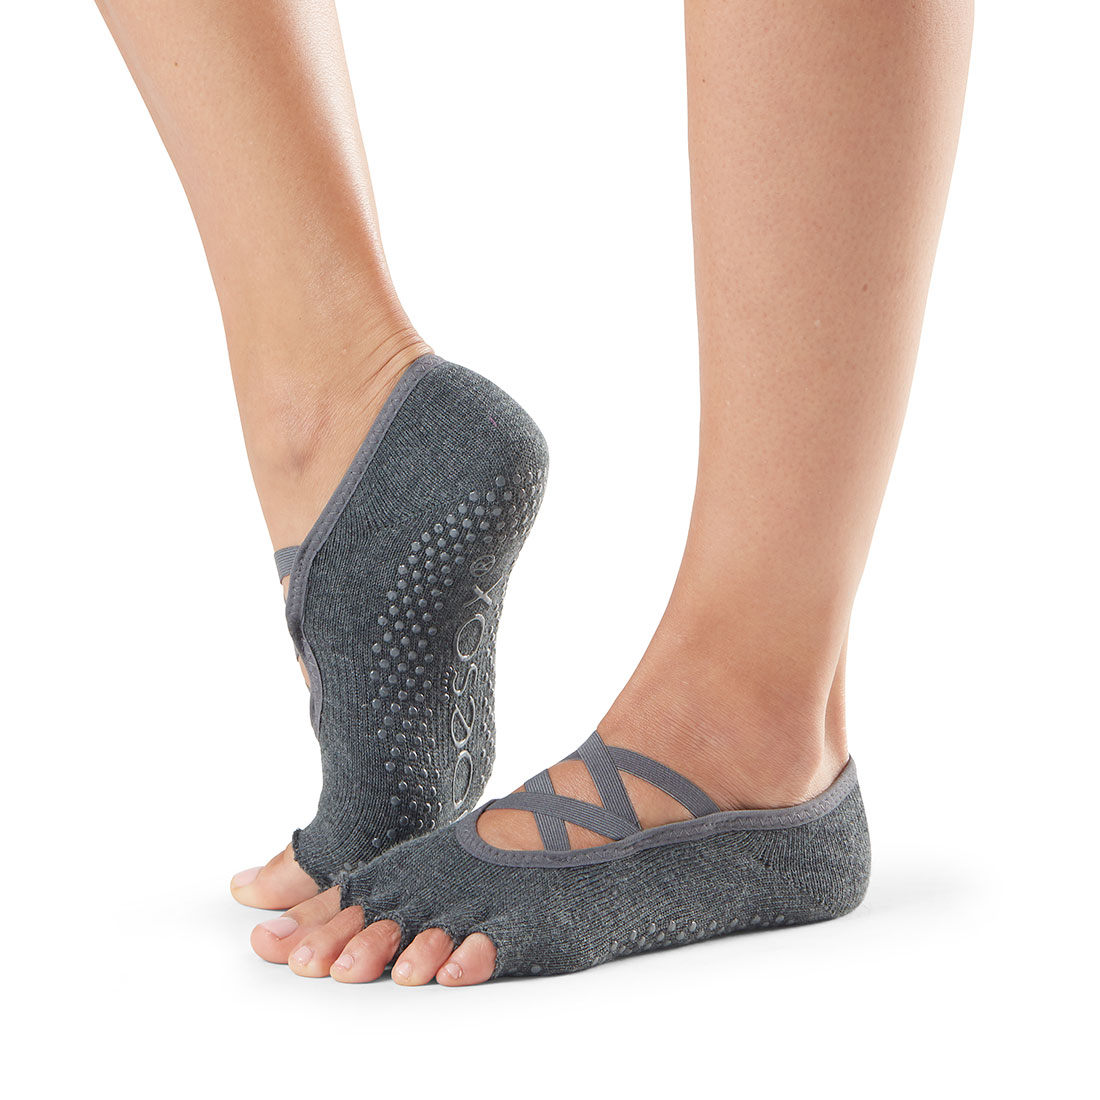 Yogasocke ToeSox Elle Half Toe Charcoal Grey